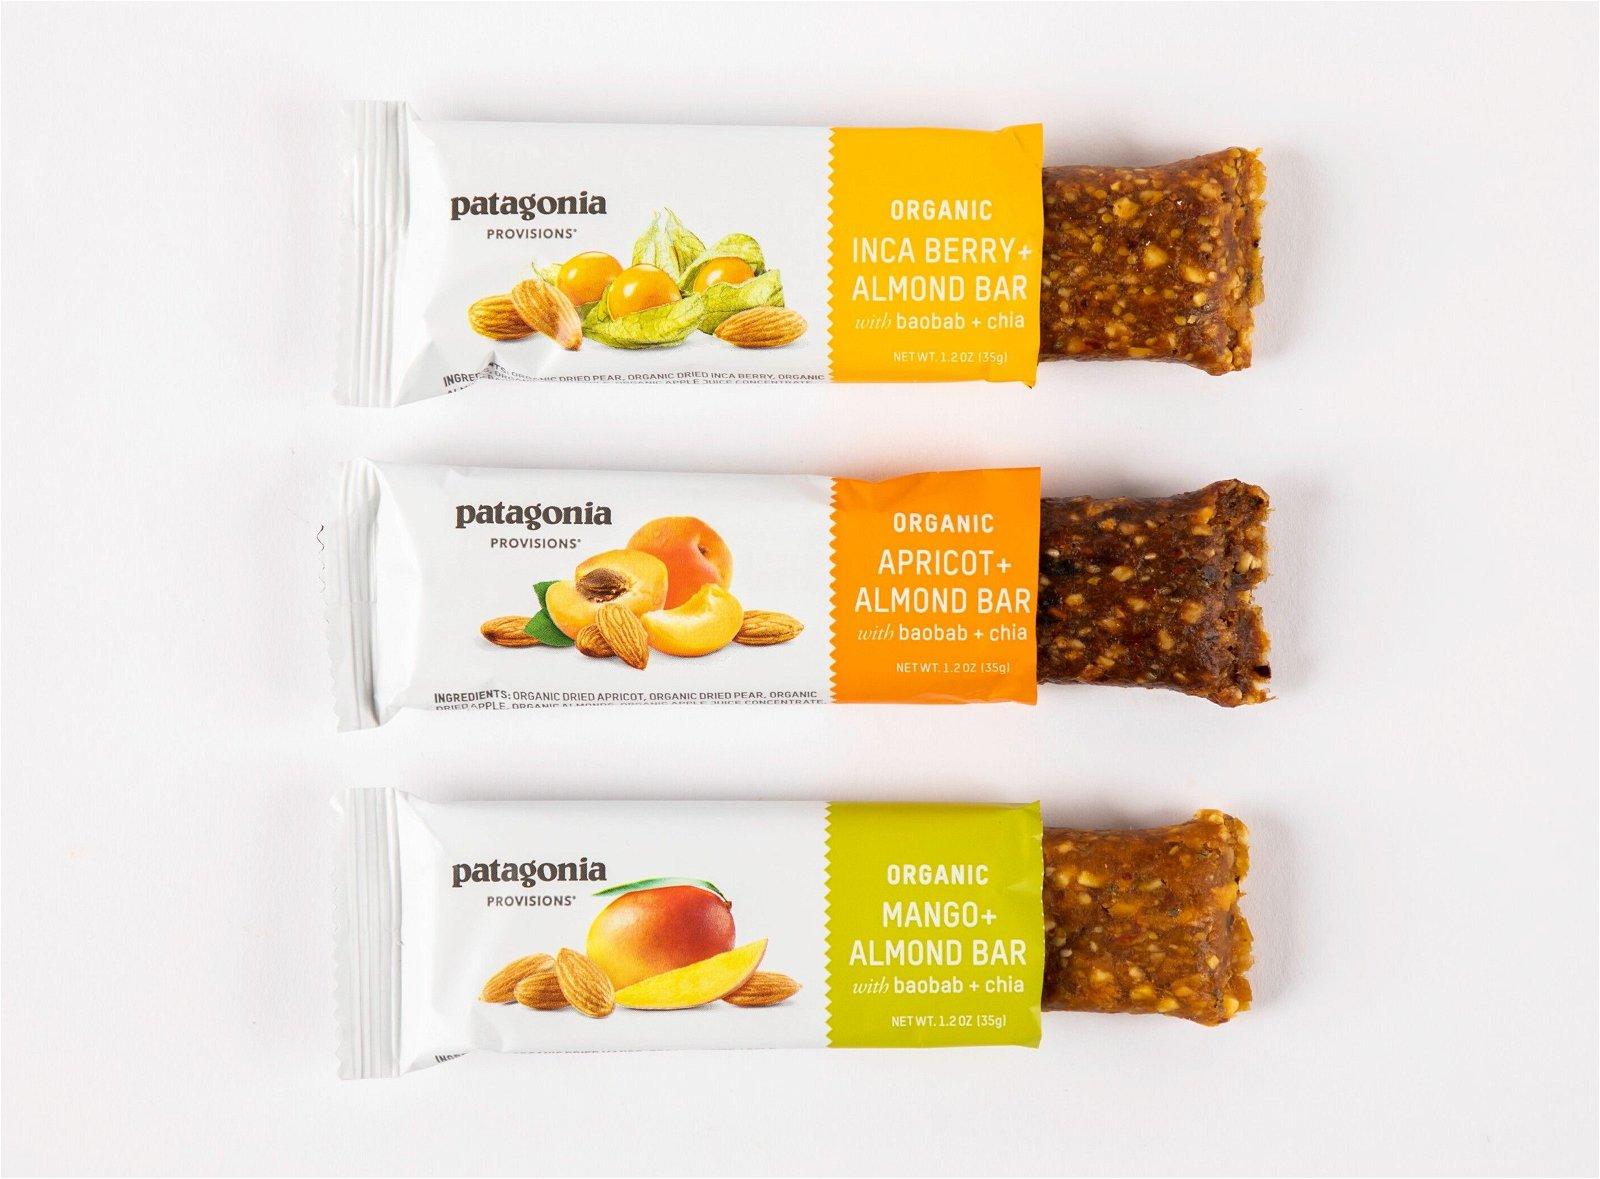 Organic Fruit + Almond Bars Image